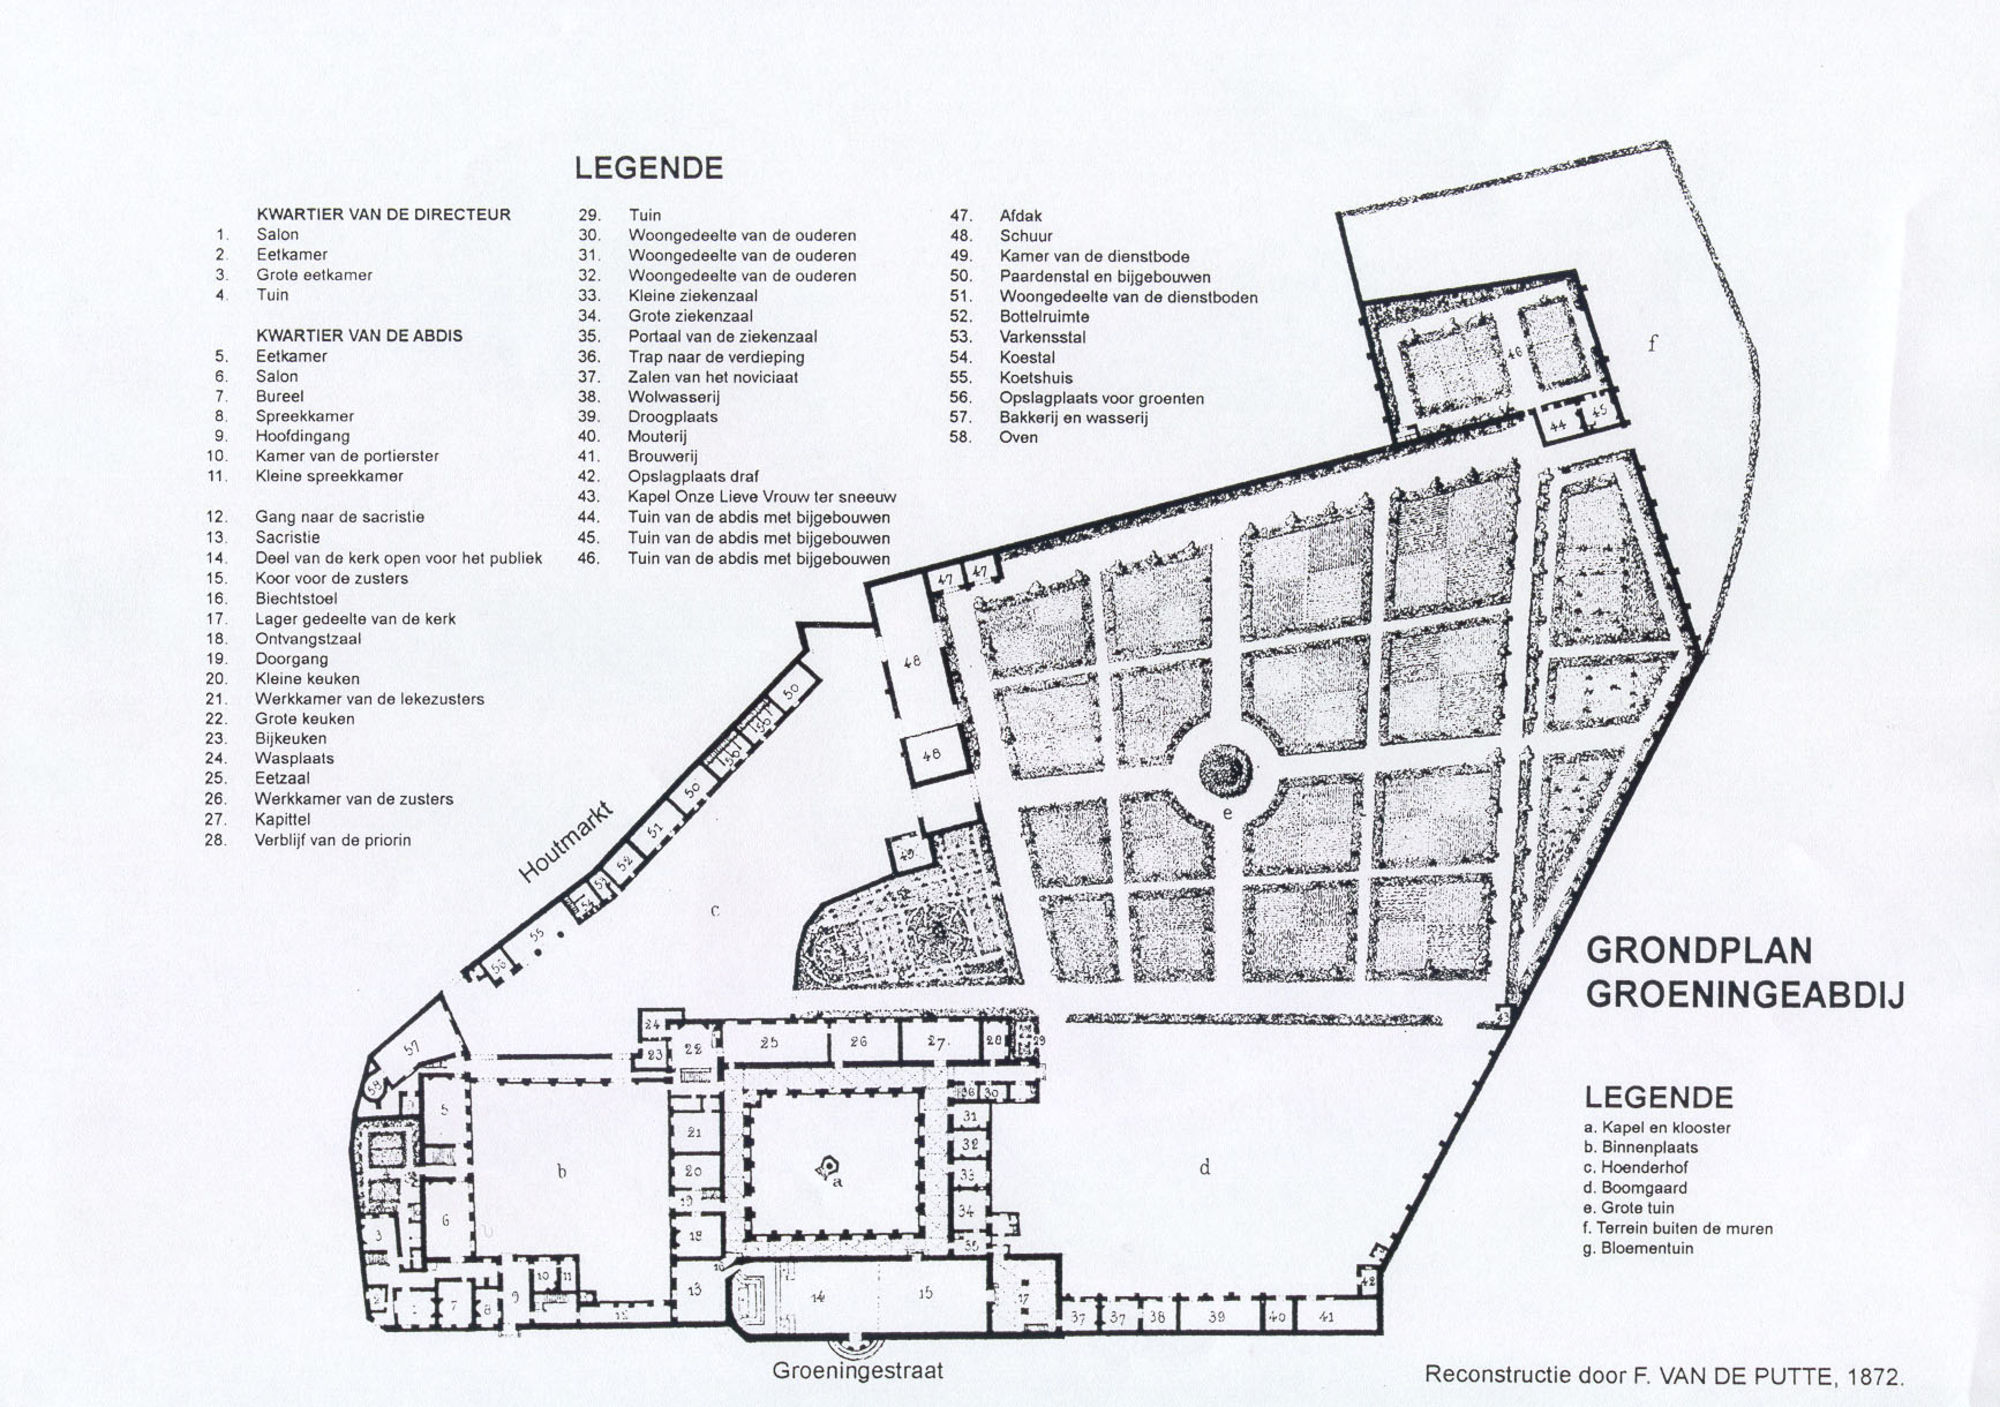 Grondplan Groeninge